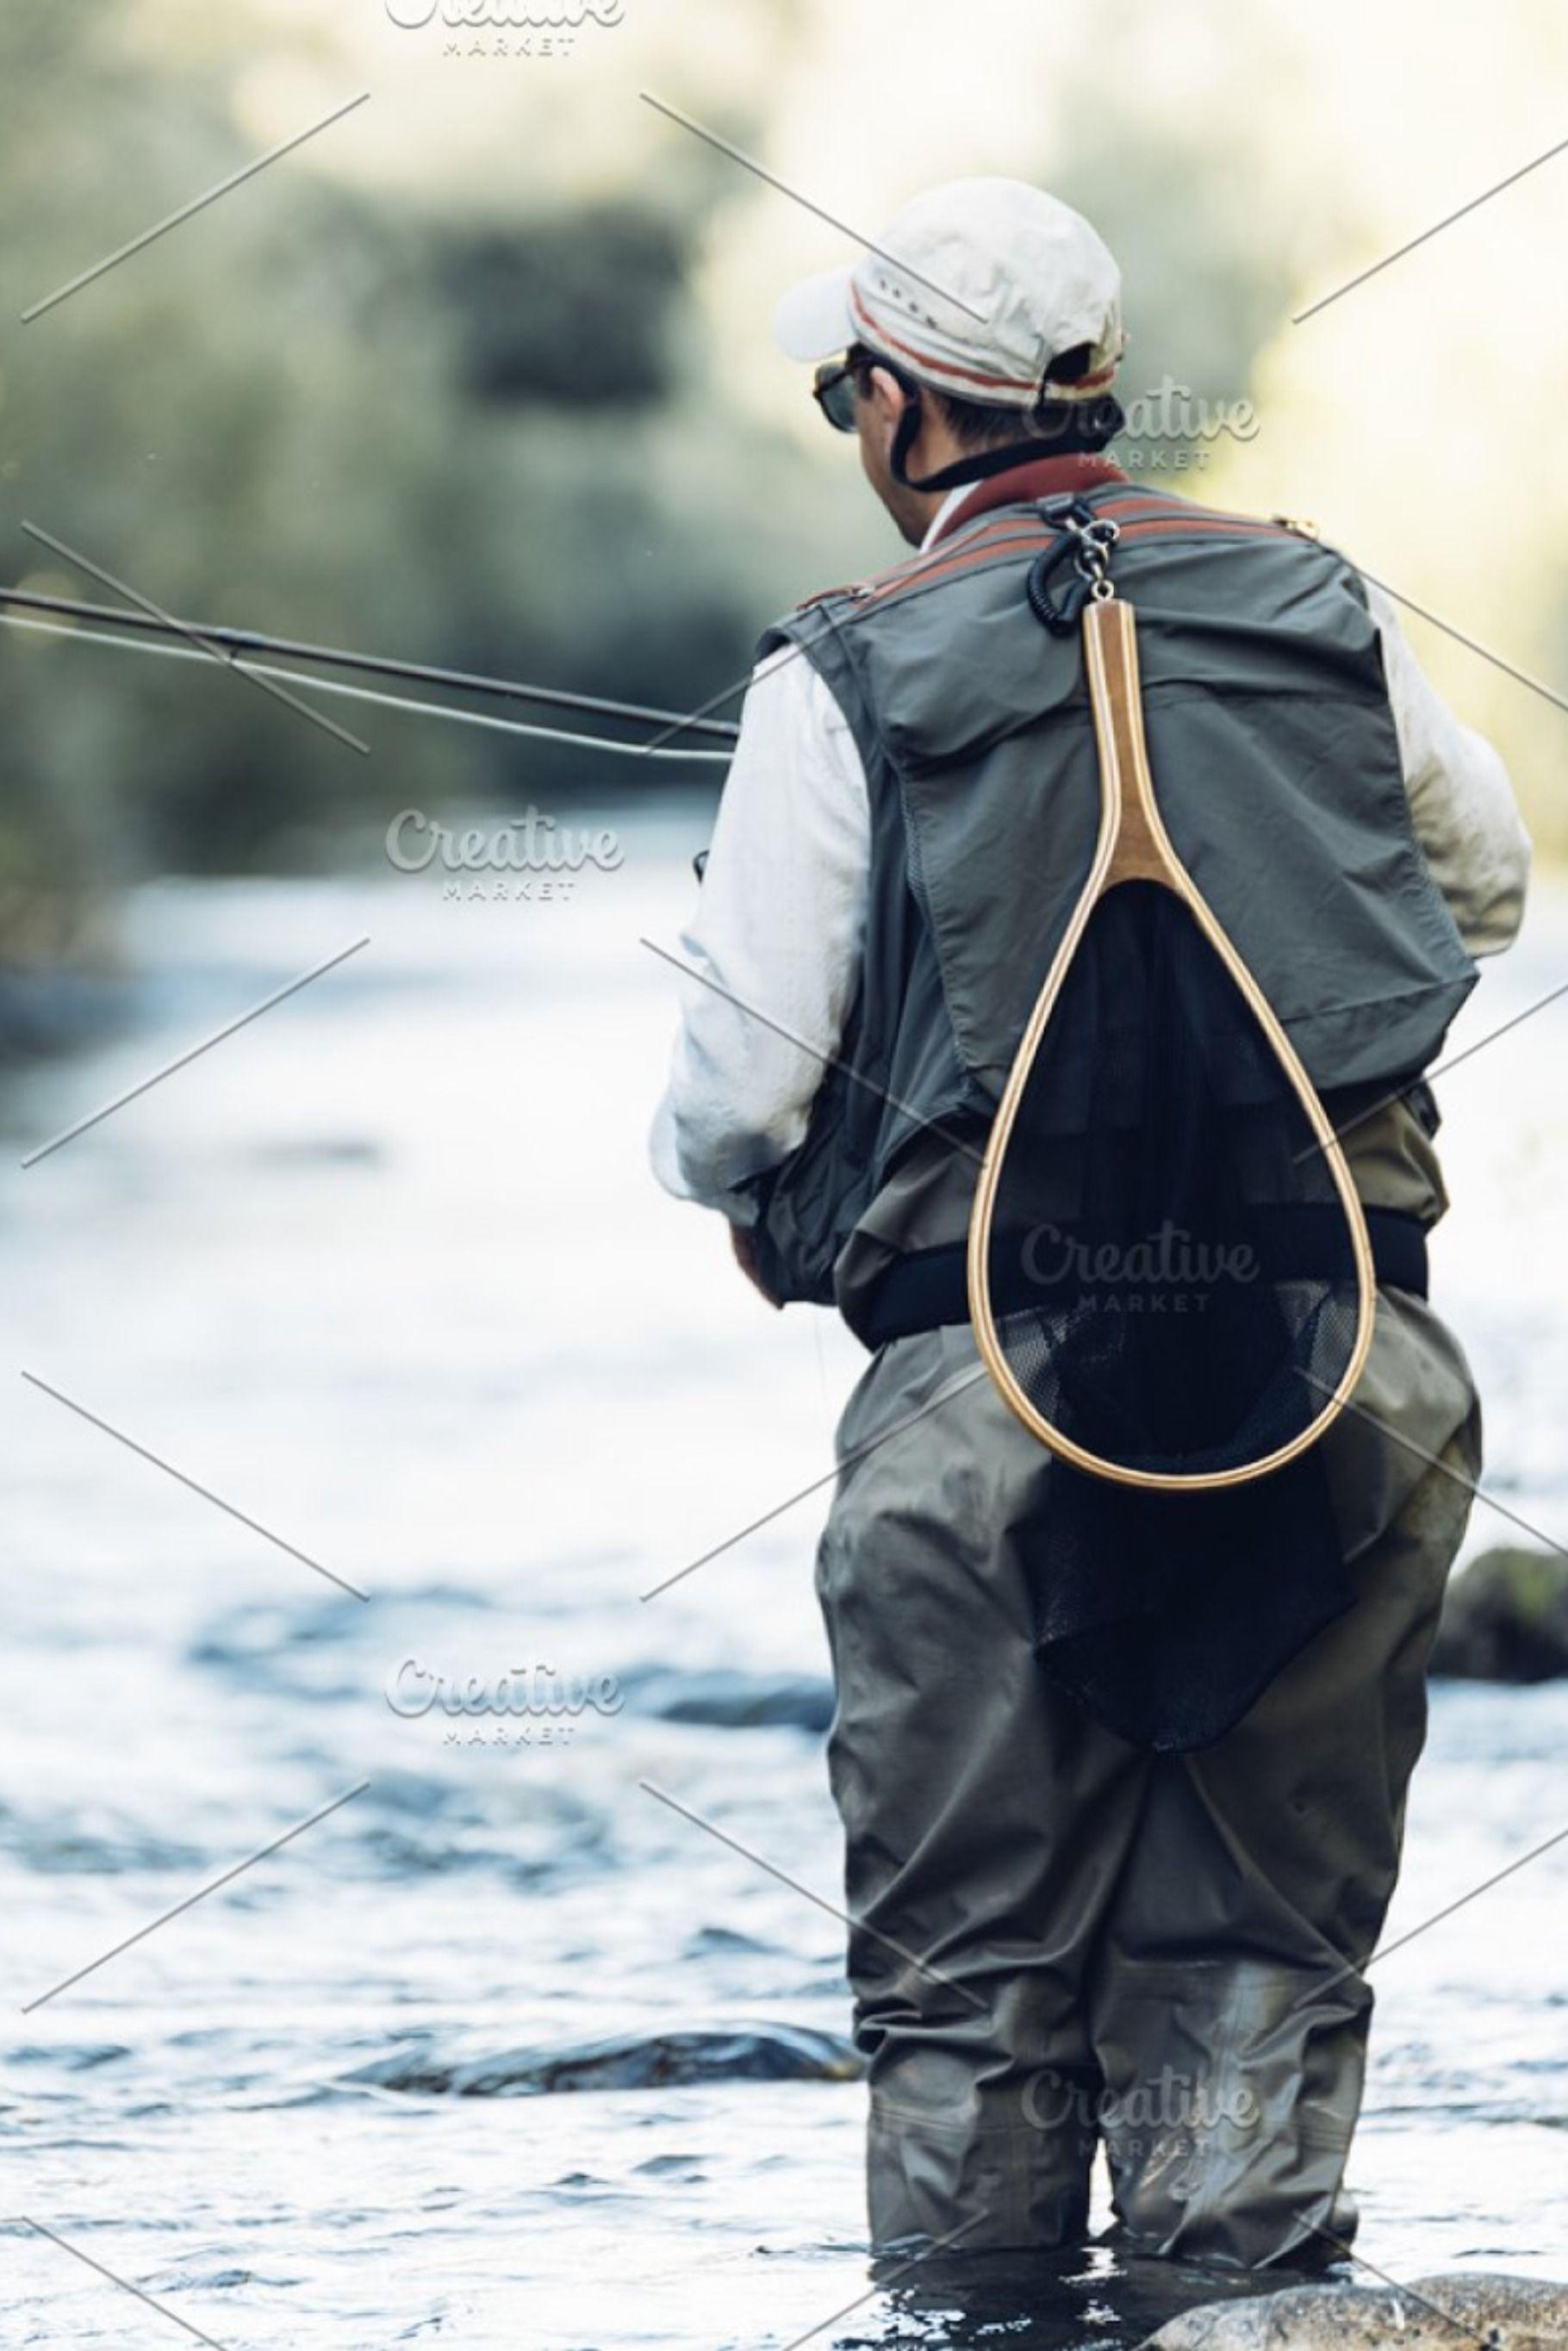 Fisherman Using Flyfishing Rod Containing Fishing Fisherman And River Fly Fishing Photo Fisherman